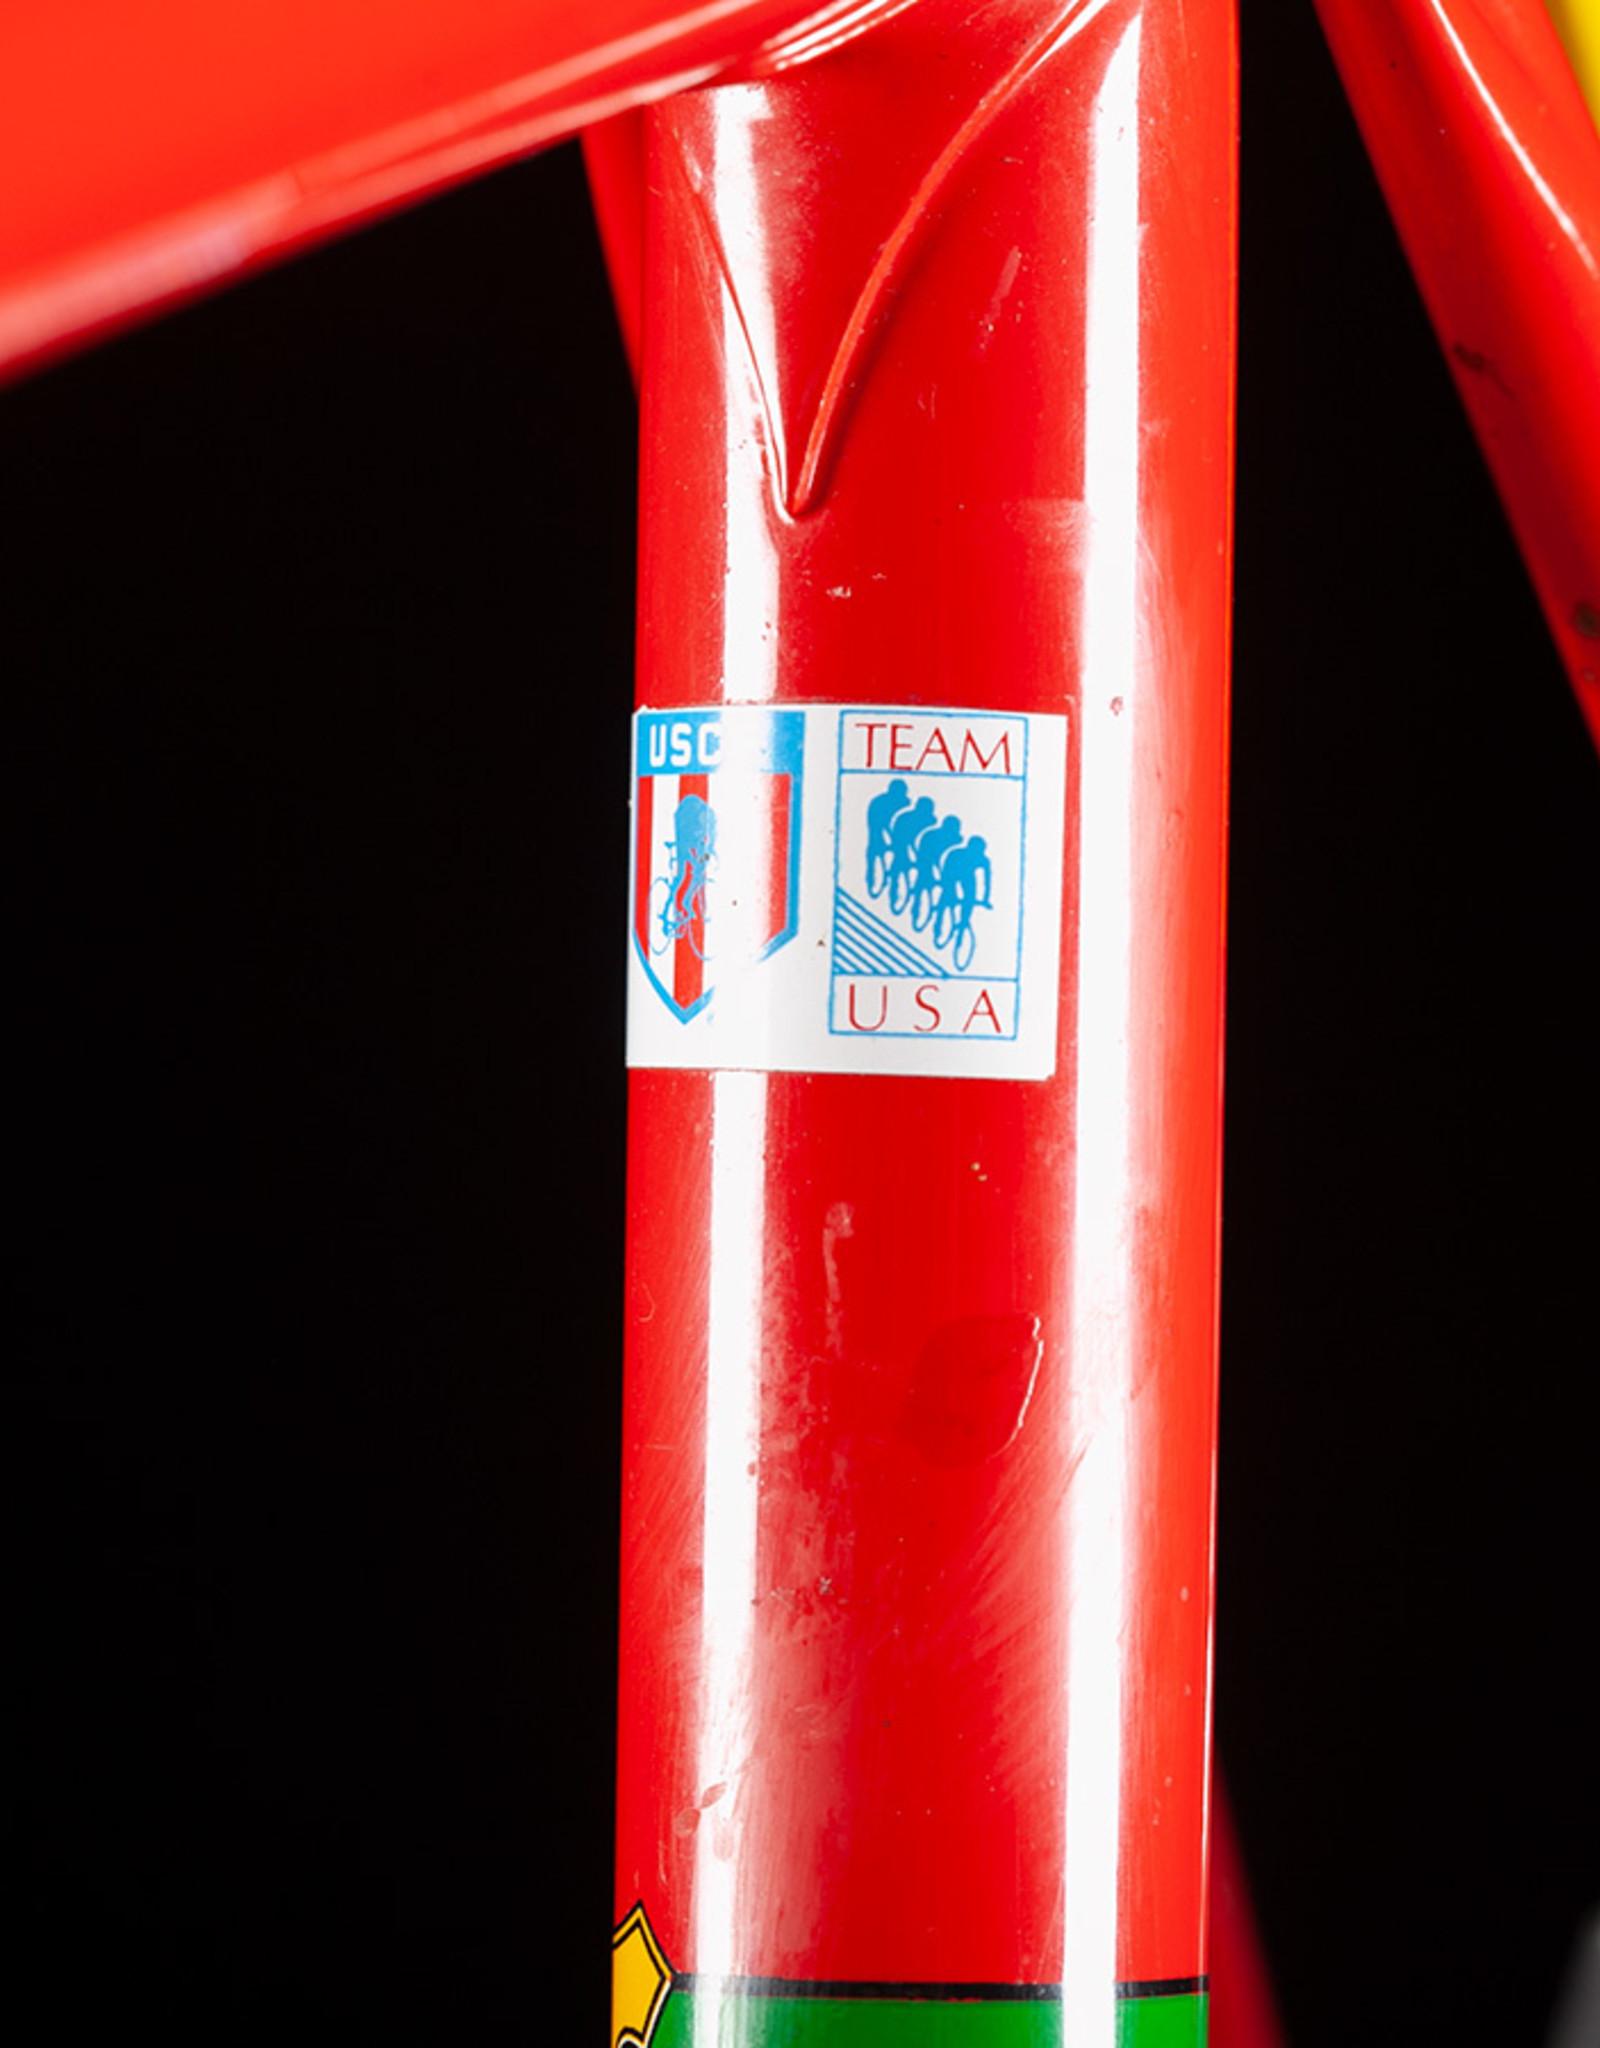 Vintage Red Tommasini Steel Road Bike Size 60cm, circa 1985 Nice and Original!